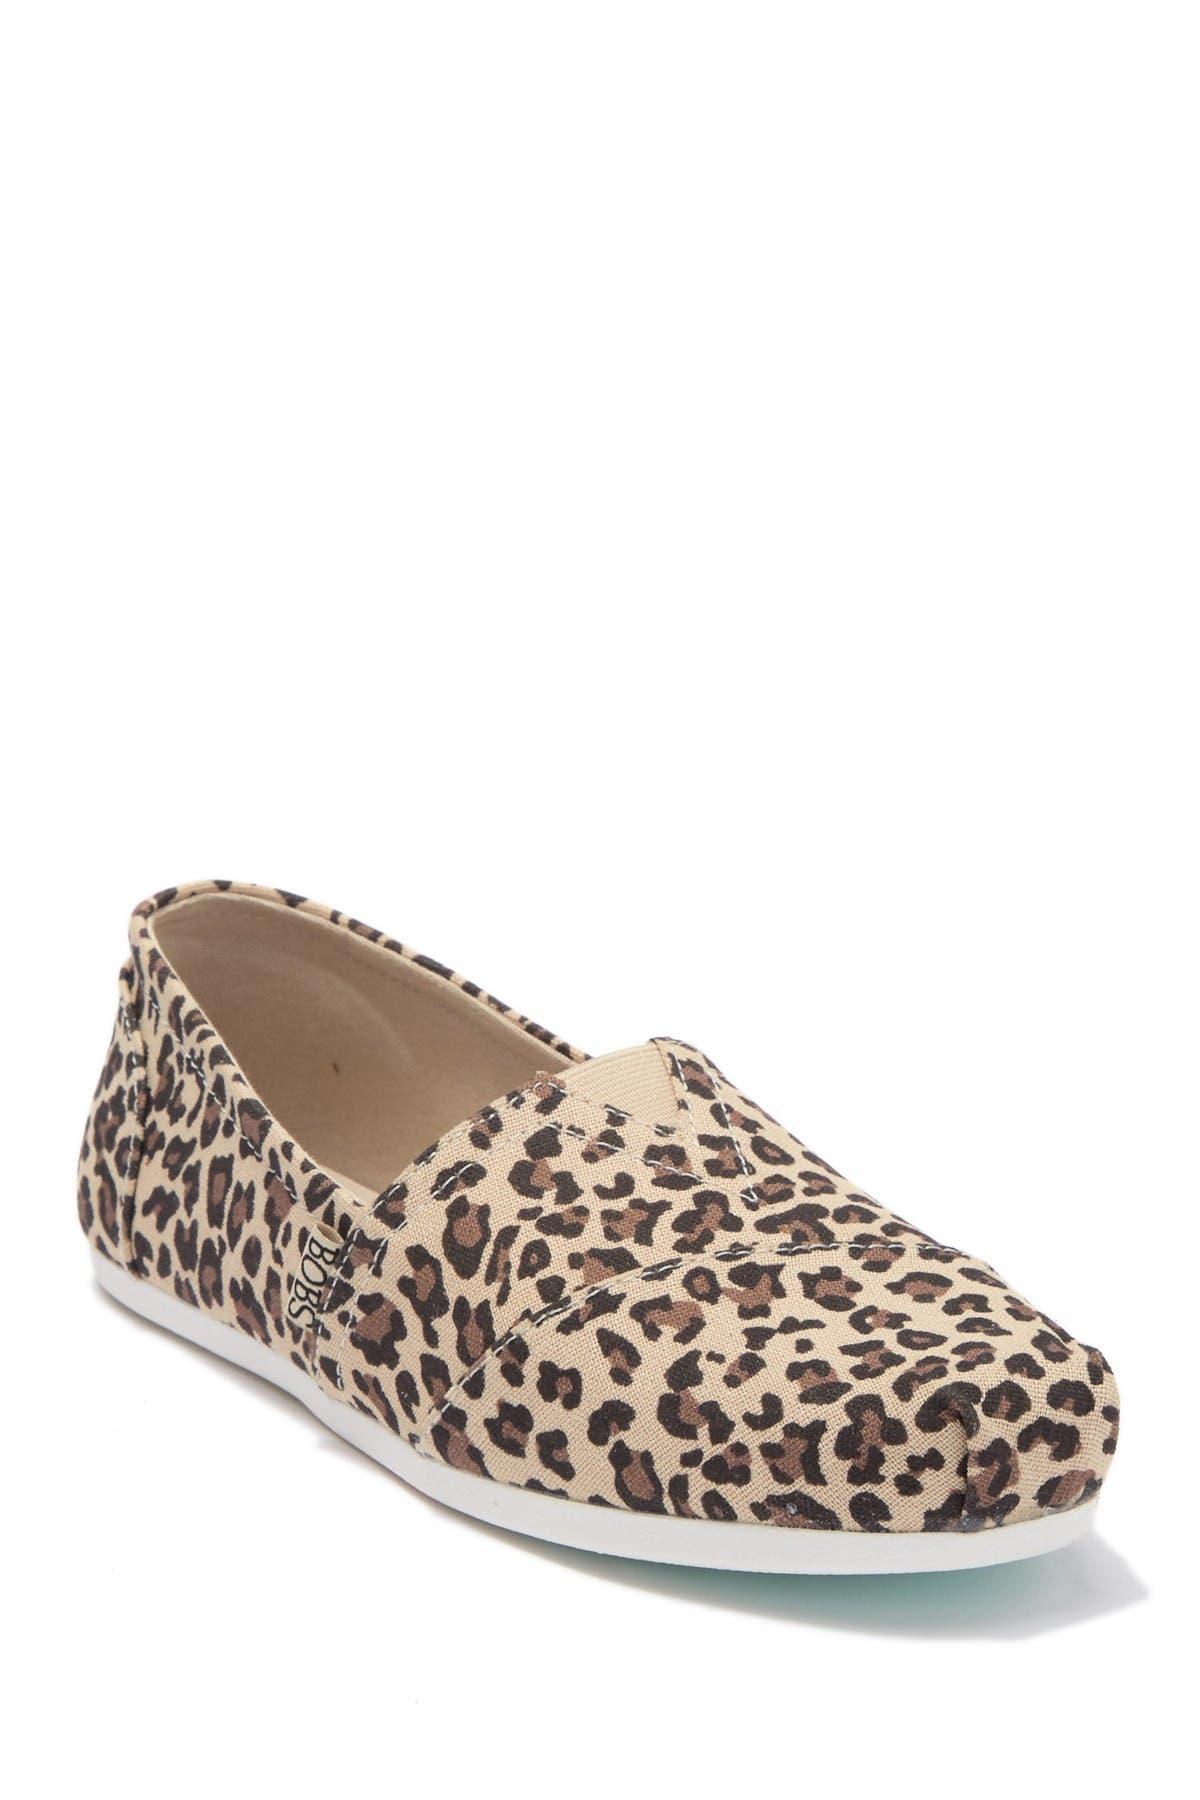 Skechers | Bobs Plush Hot Spot Leopard